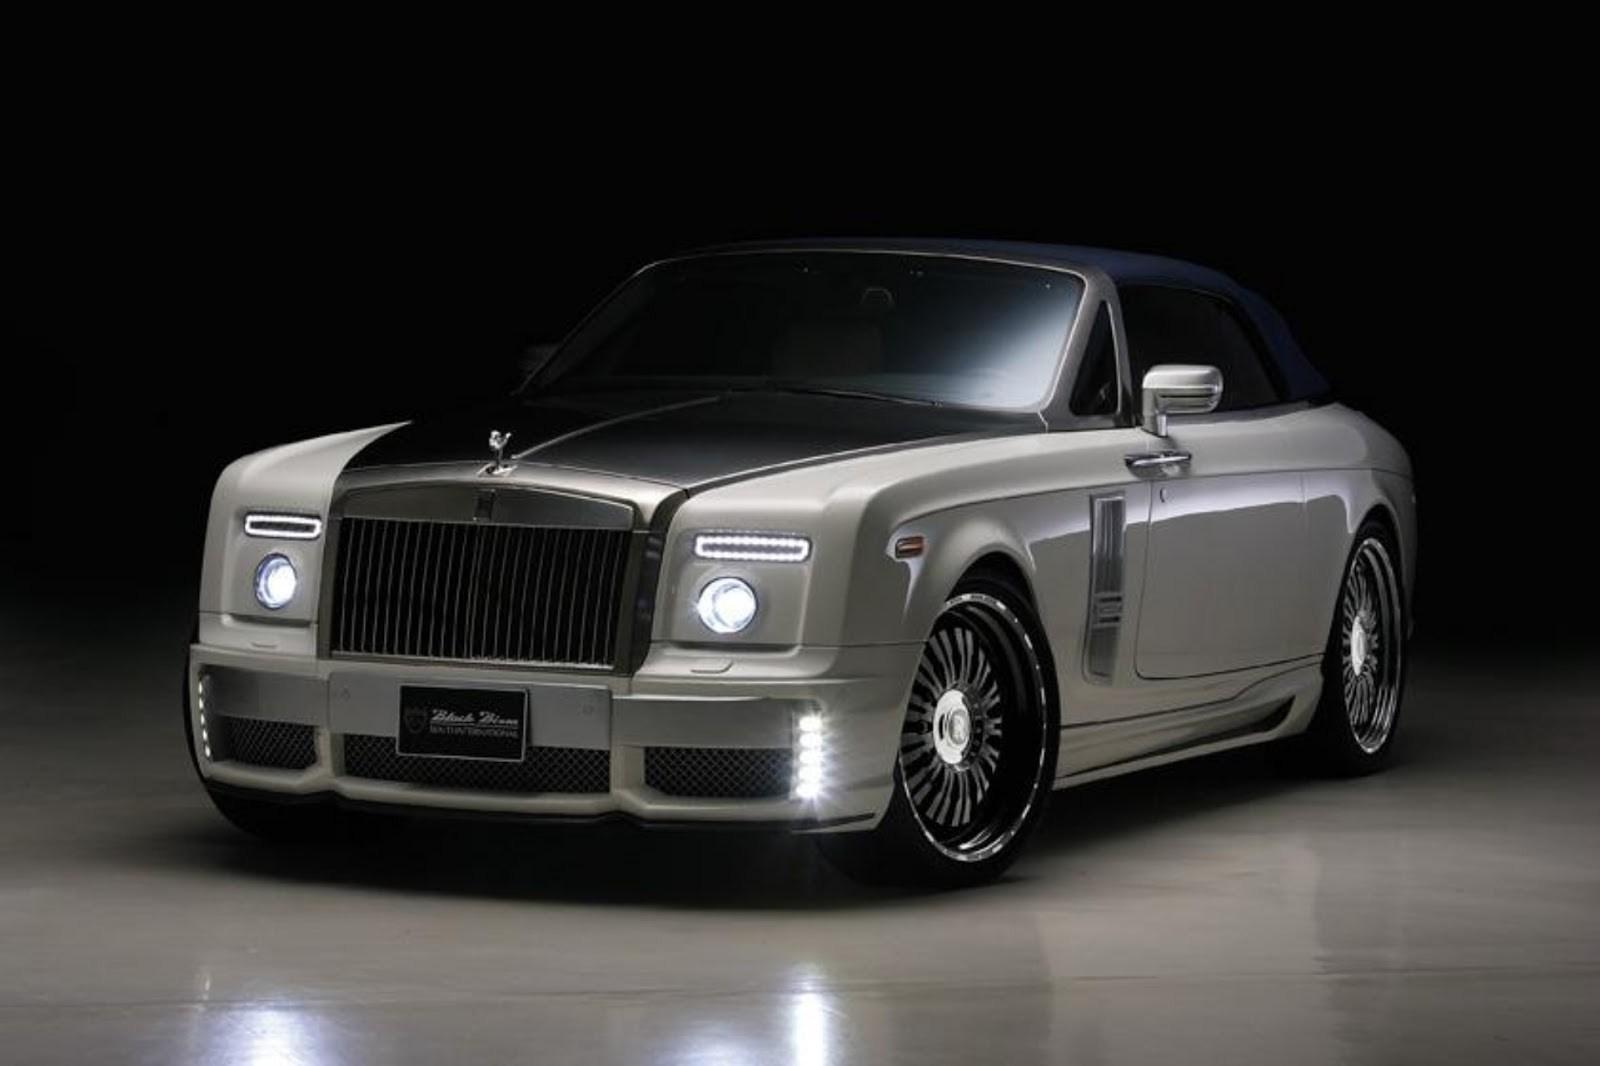 2015 rolls royce wraith drophead cars. Black Bedroom Furniture Sets. Home Design Ideas